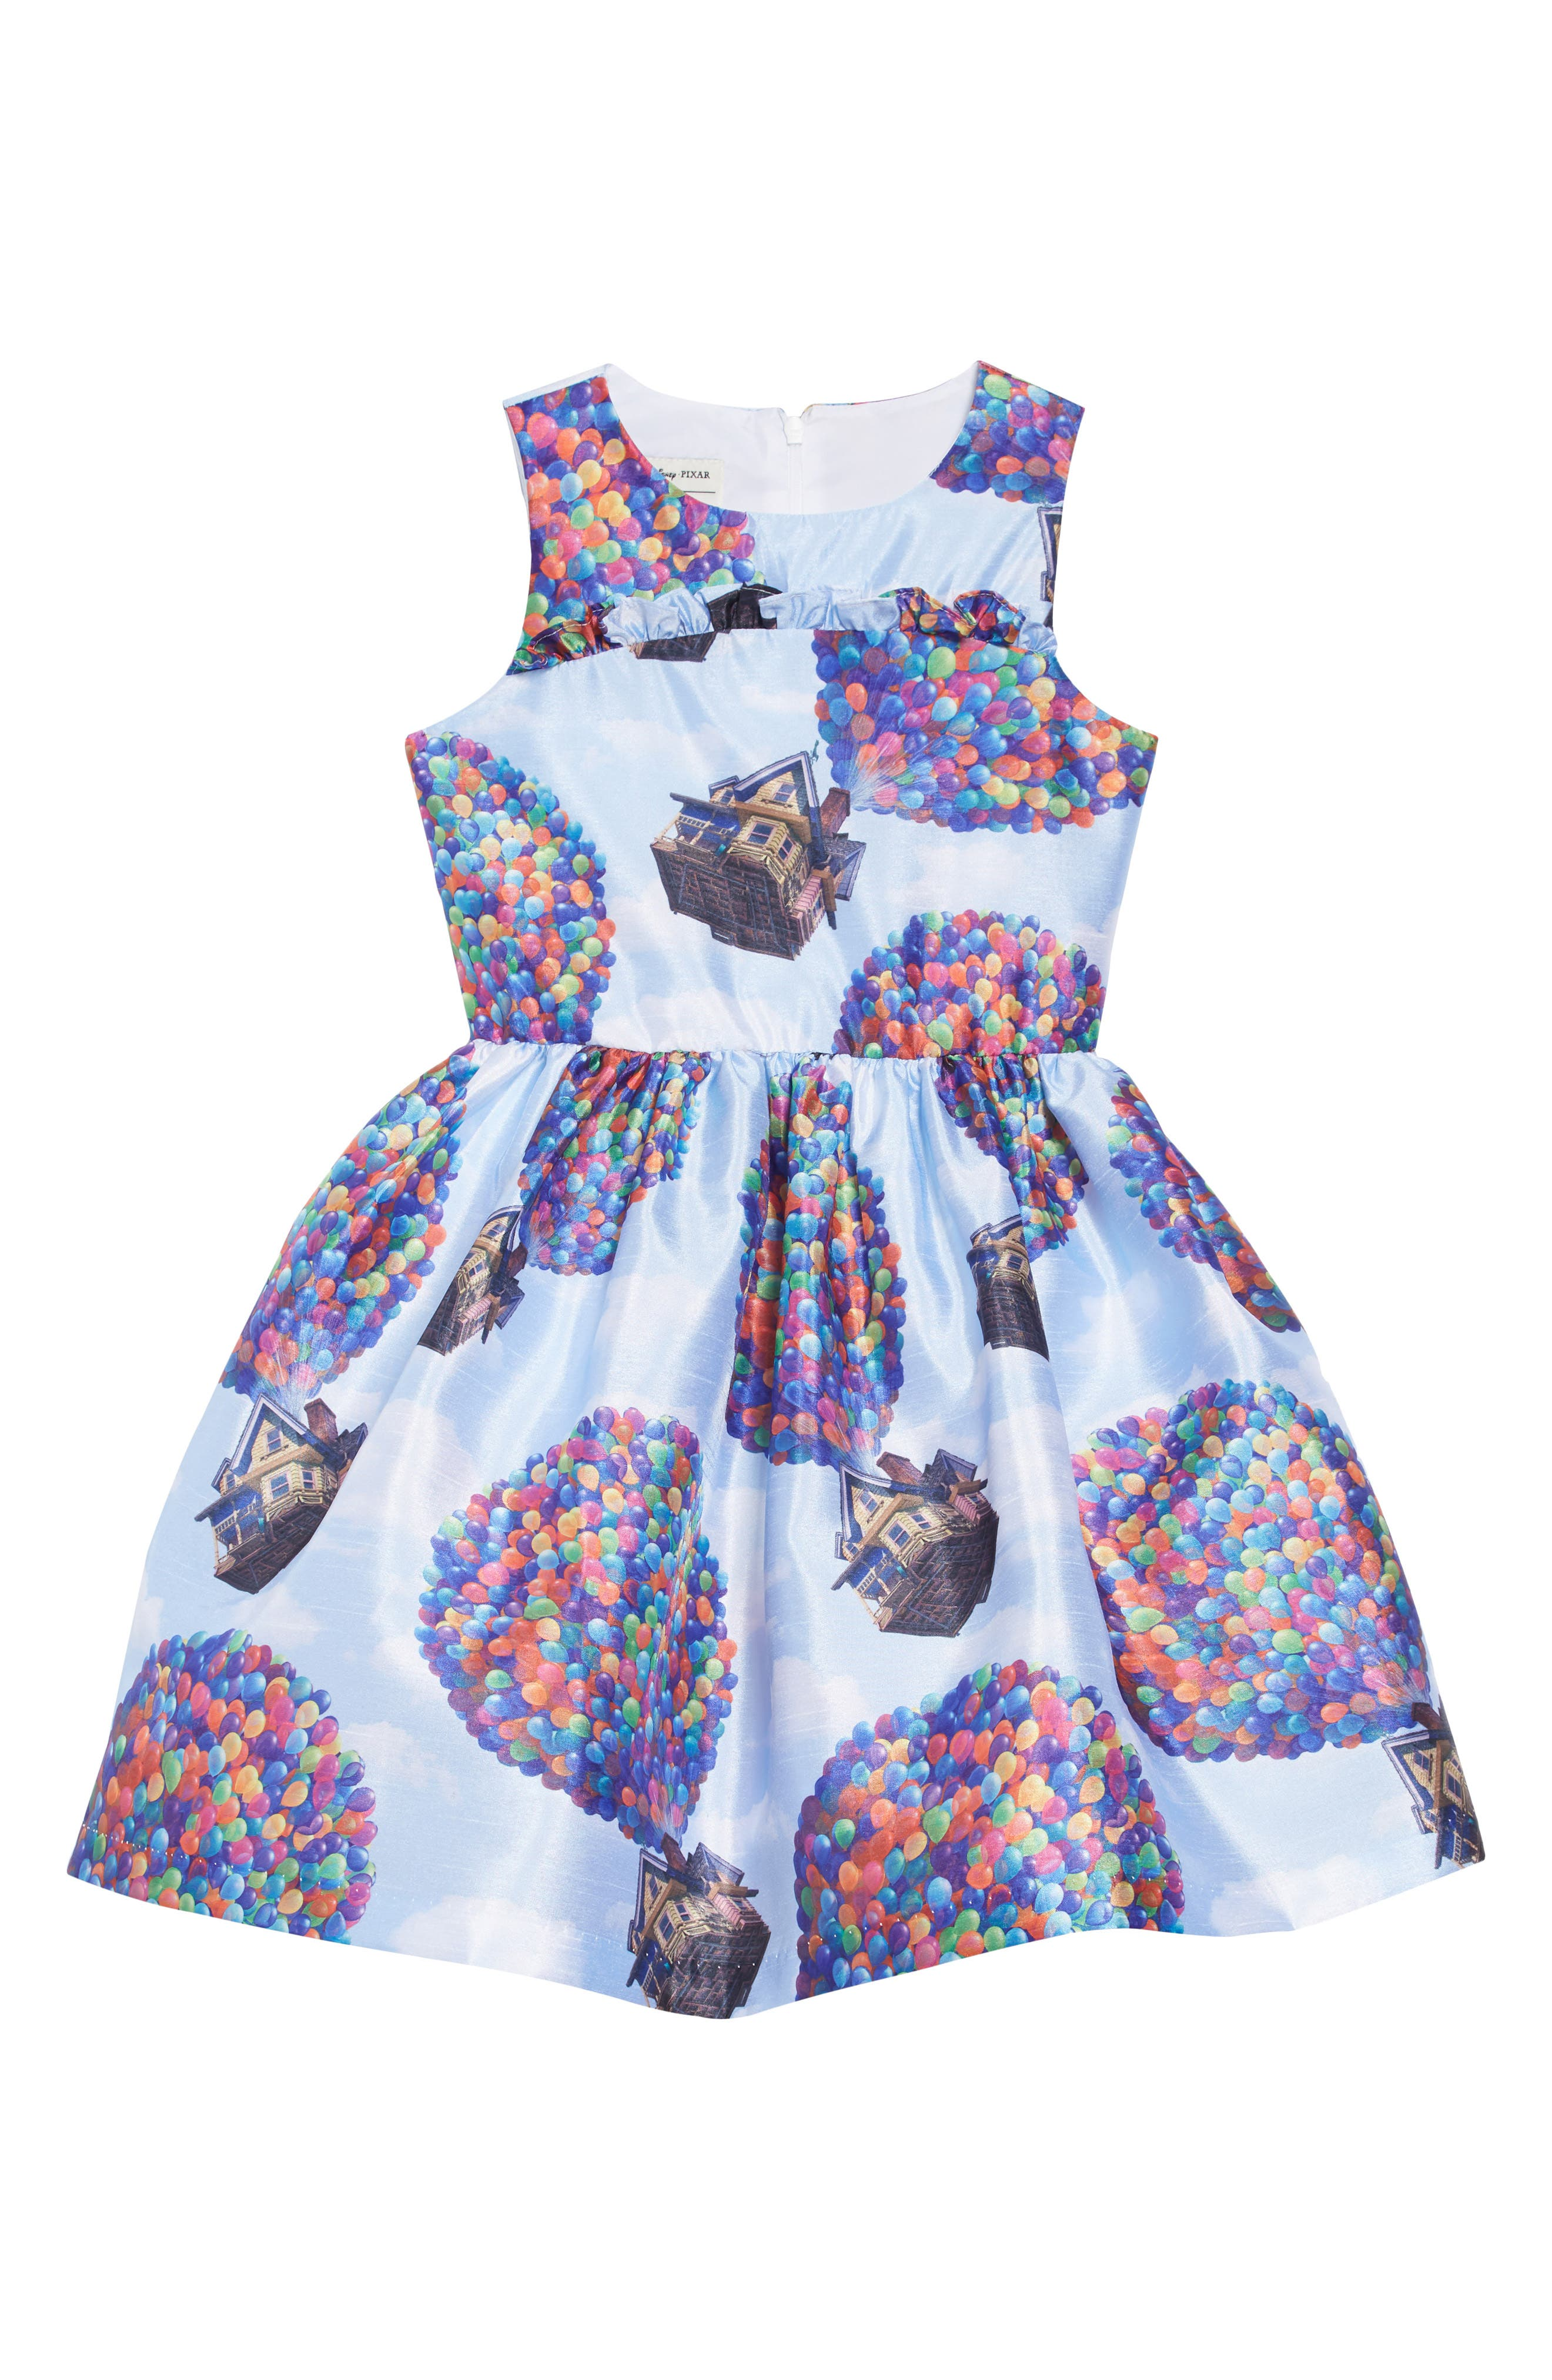 PIPPA & JULIE x Disney<sup>®</sup> Up House Fit & Flare Dress, Main, color, BLUE